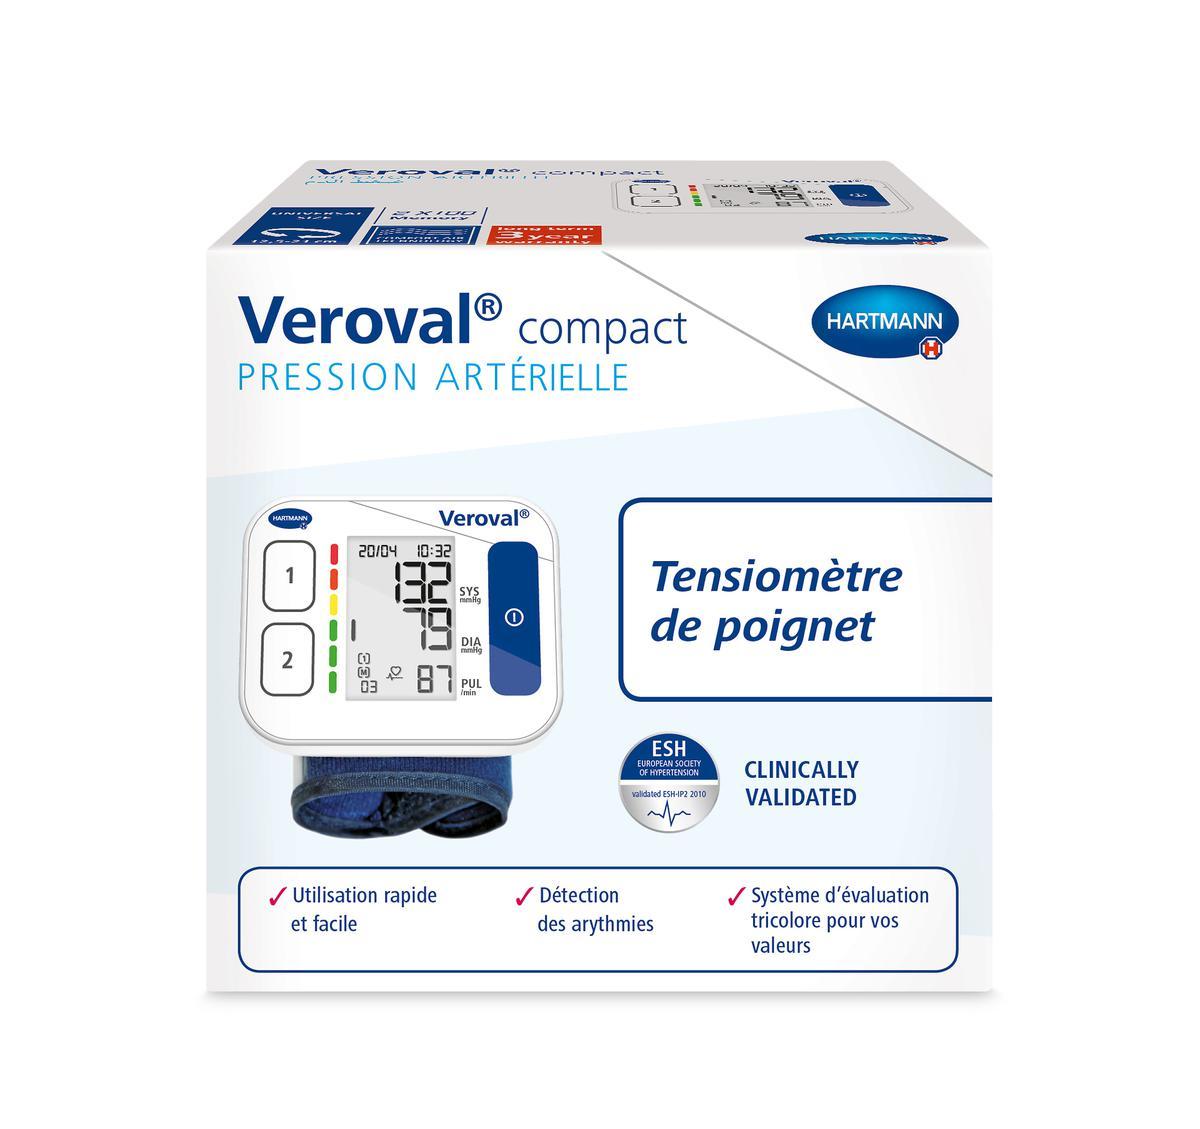 Veroval Compact Tensiometre De Poignet